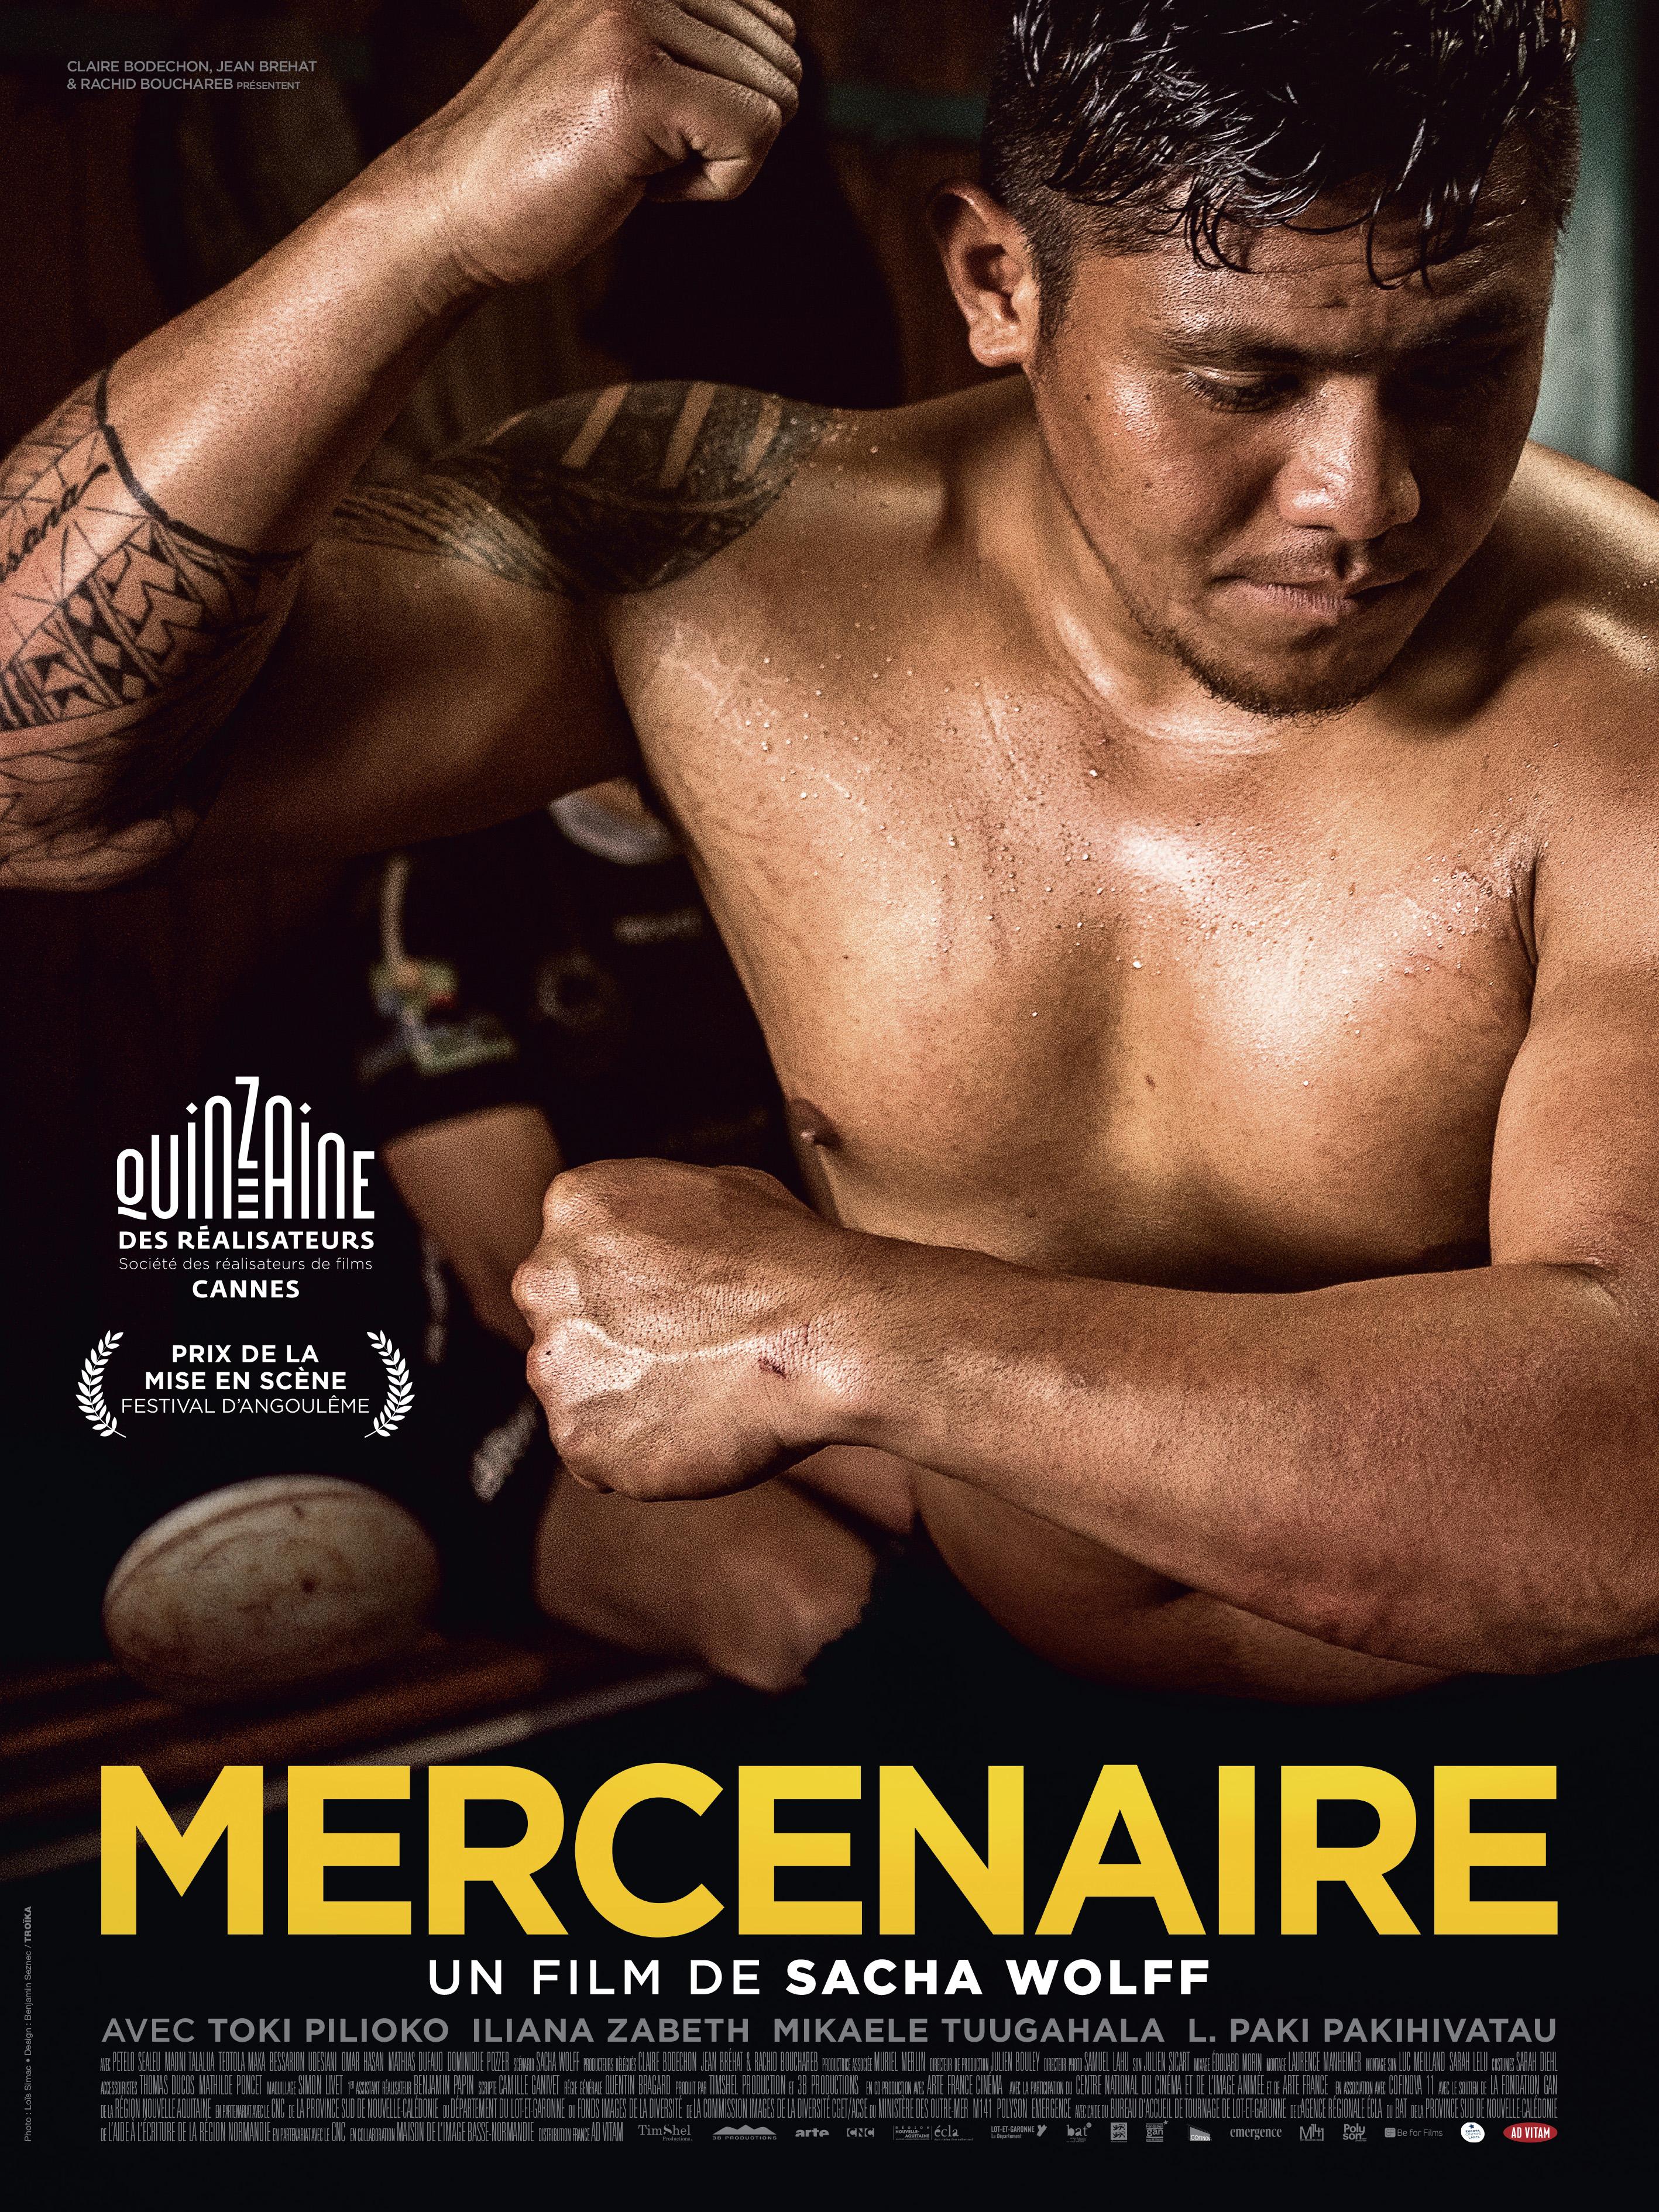 image Mercenaire Watch Full Movie Free Online